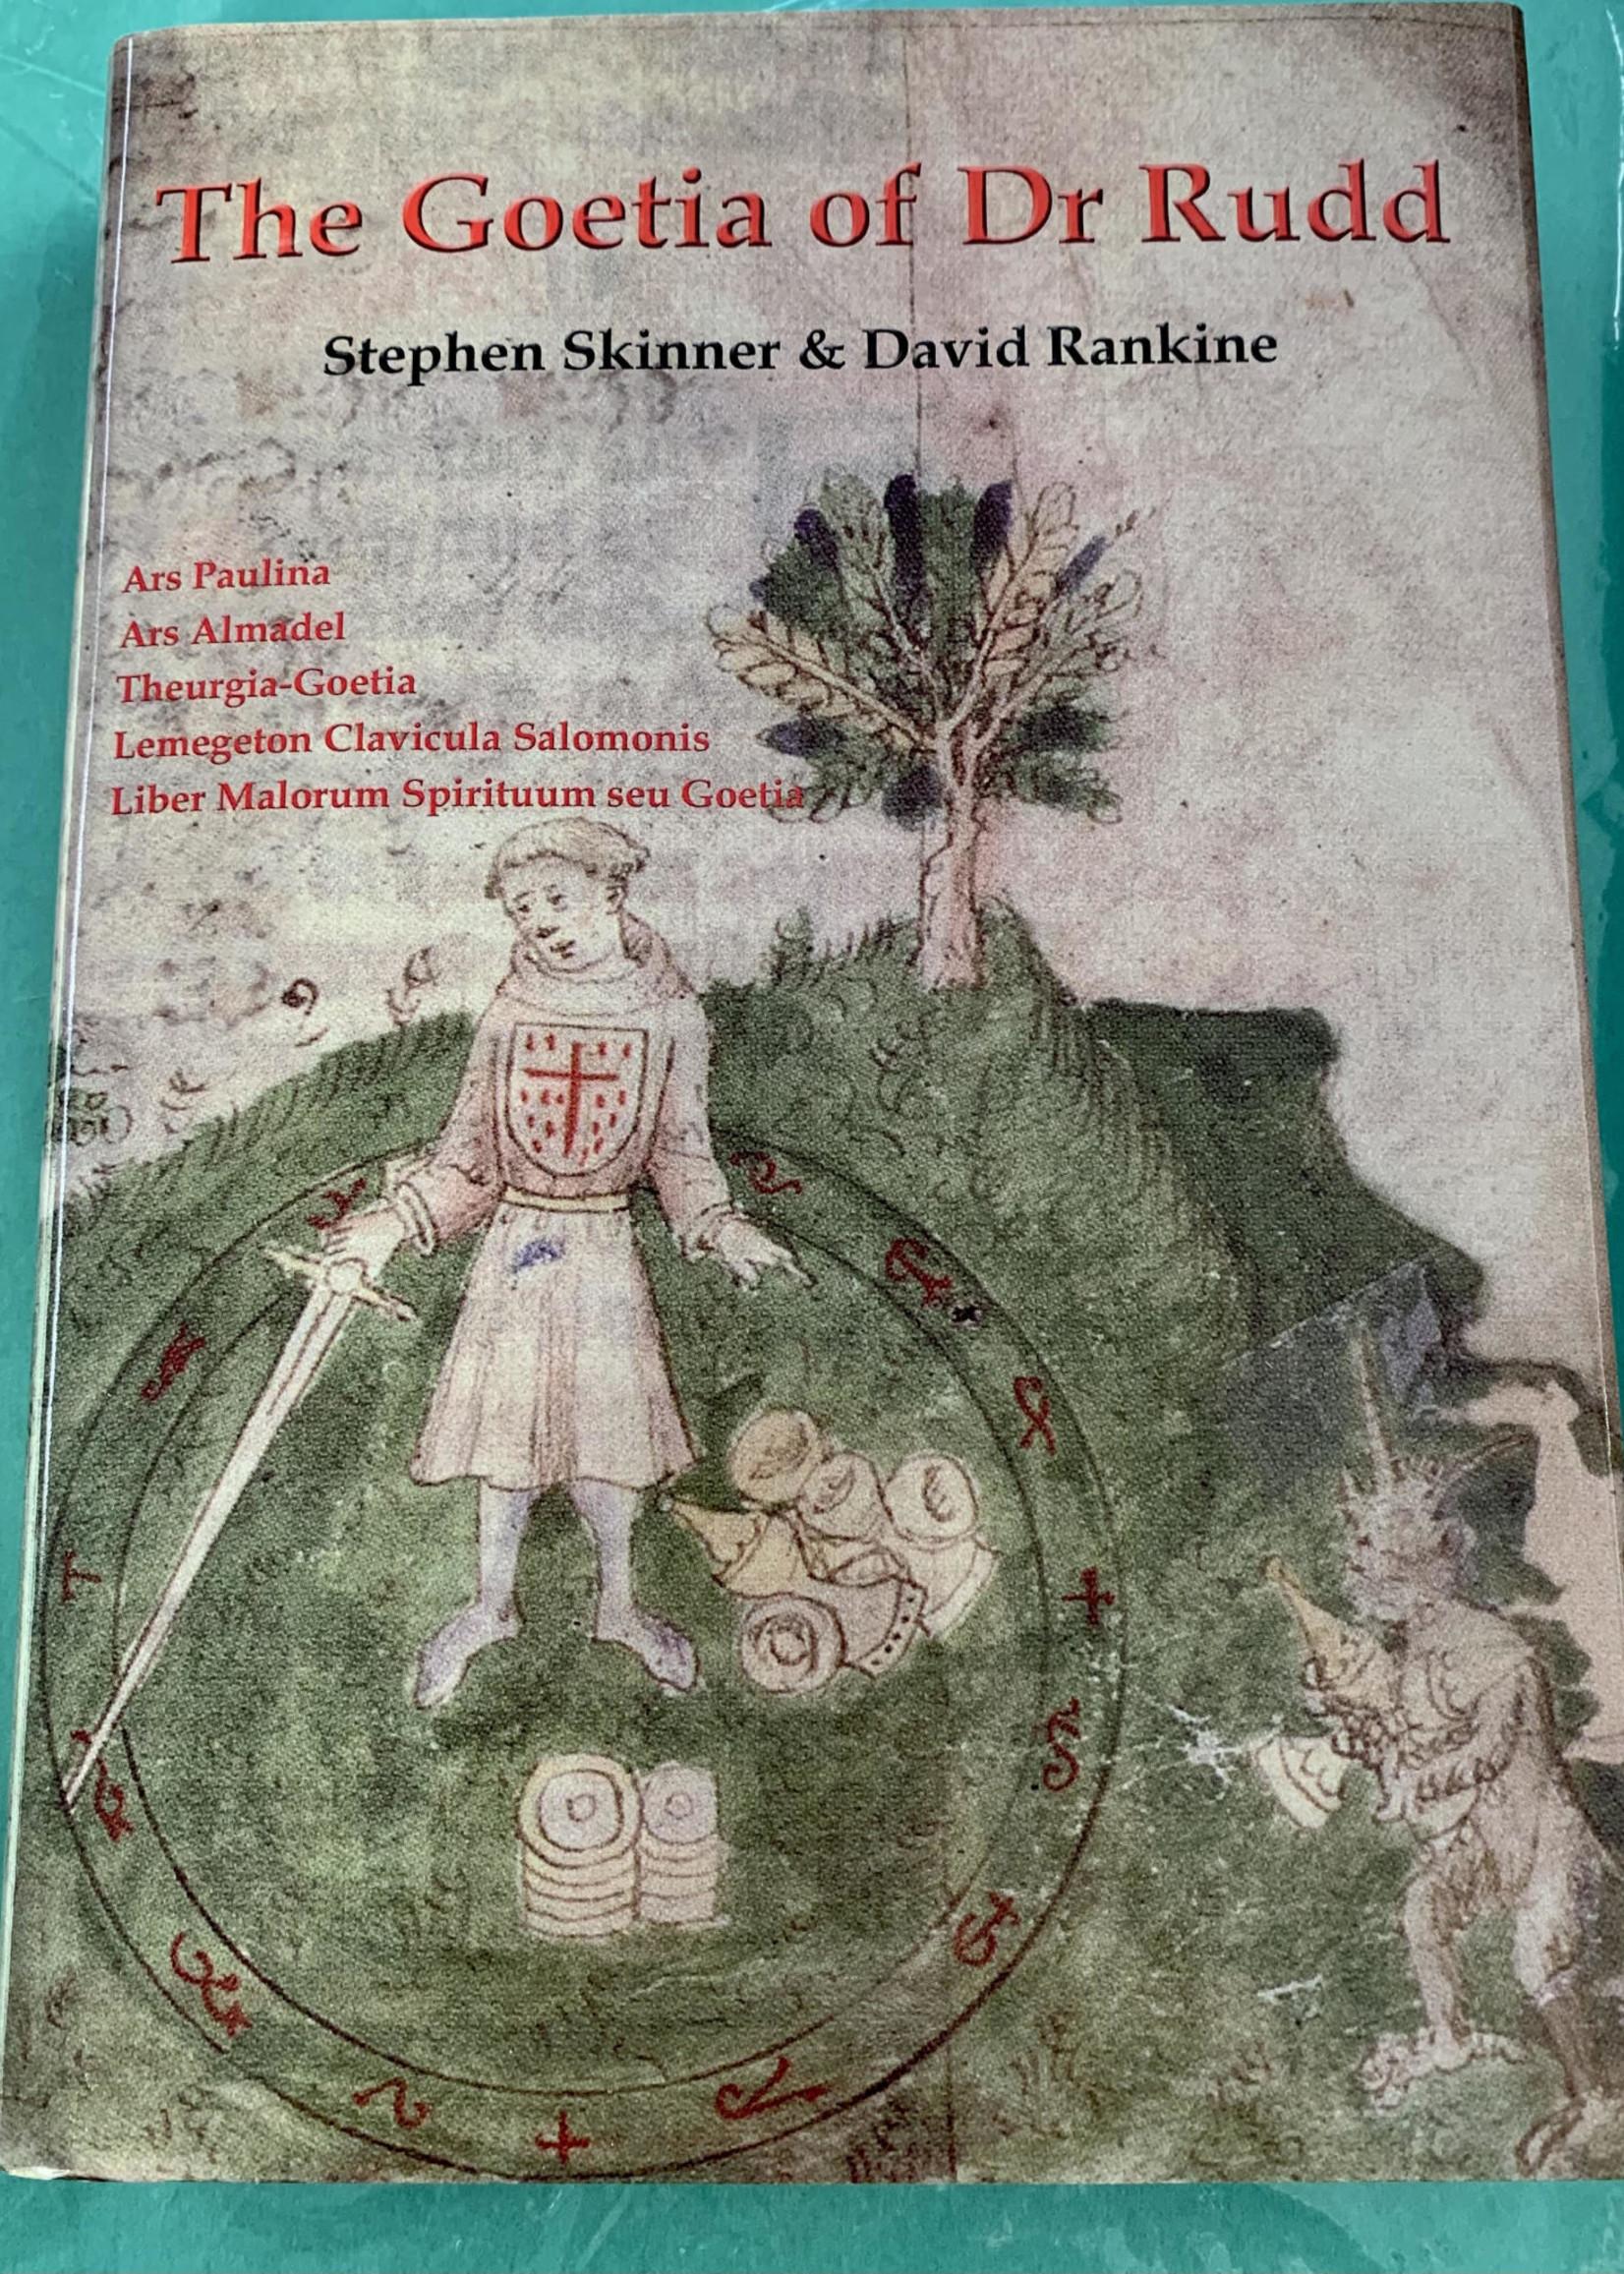 The Goetia of Dr. Rudd - BY DR STEPHEN SKINNER, DAVID RANKINE